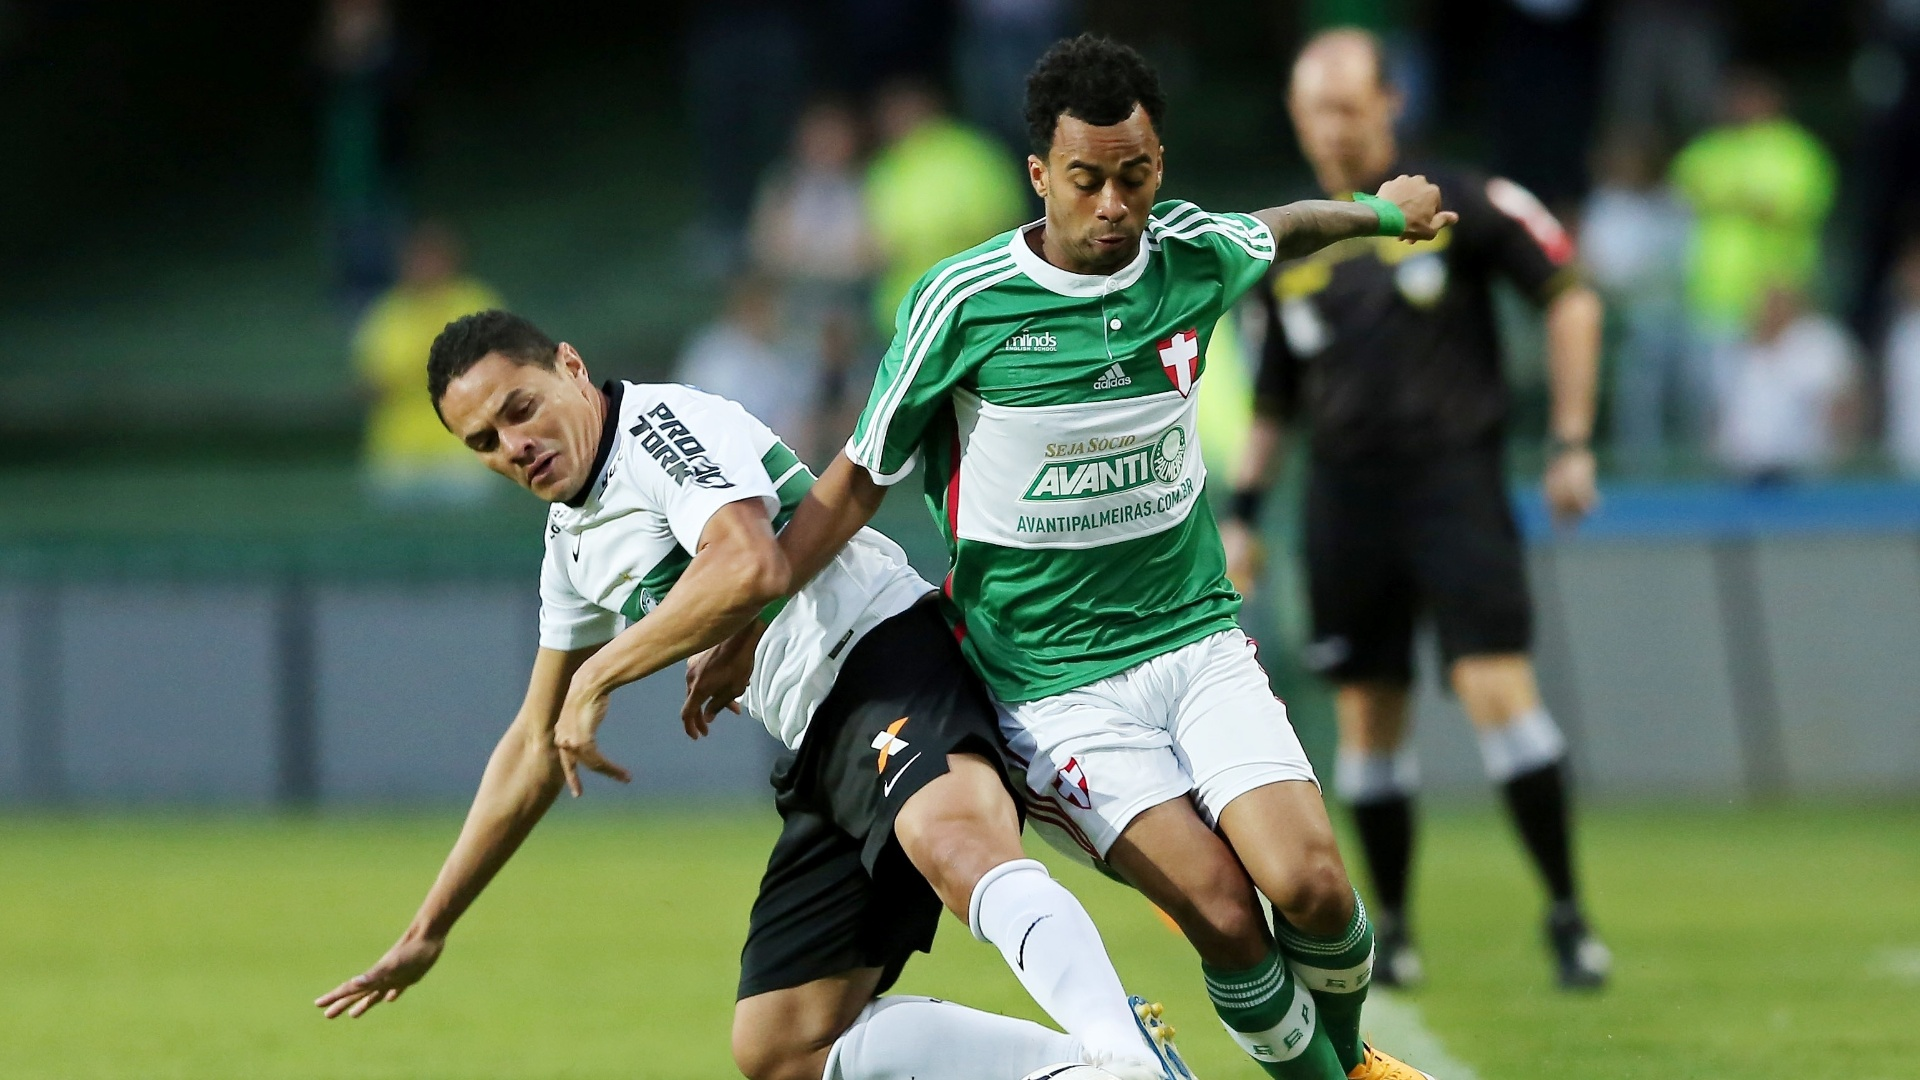 Hélder (esquerda), do Coritiba, disputa bola com Wesley, do Palmeiras